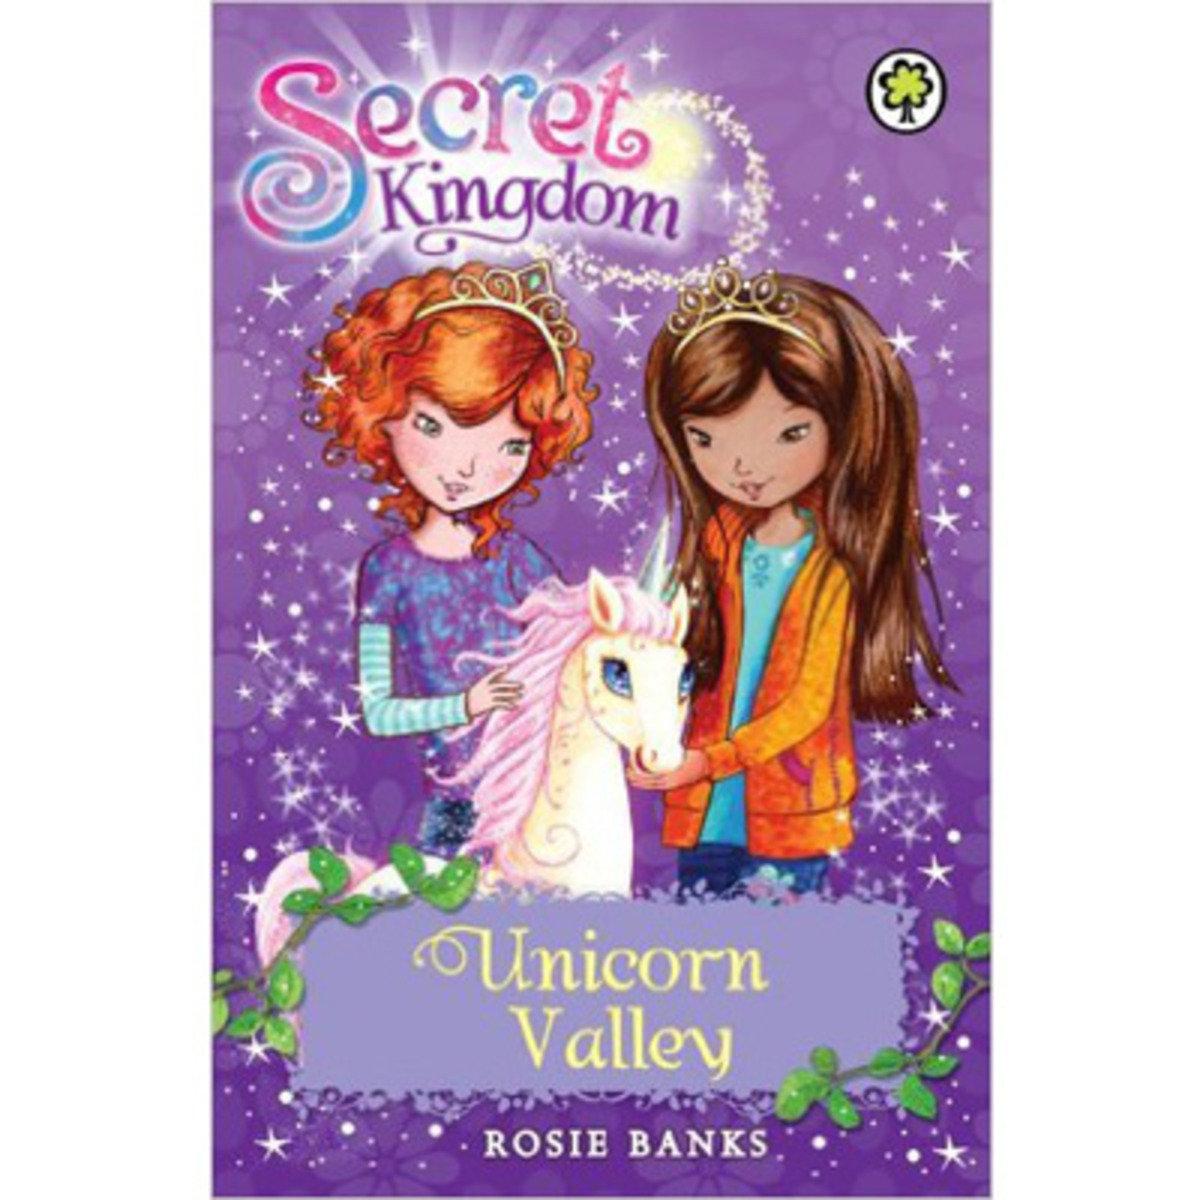 SECRET KINGDOM #2 UNICORN VALLEY 9781408323656